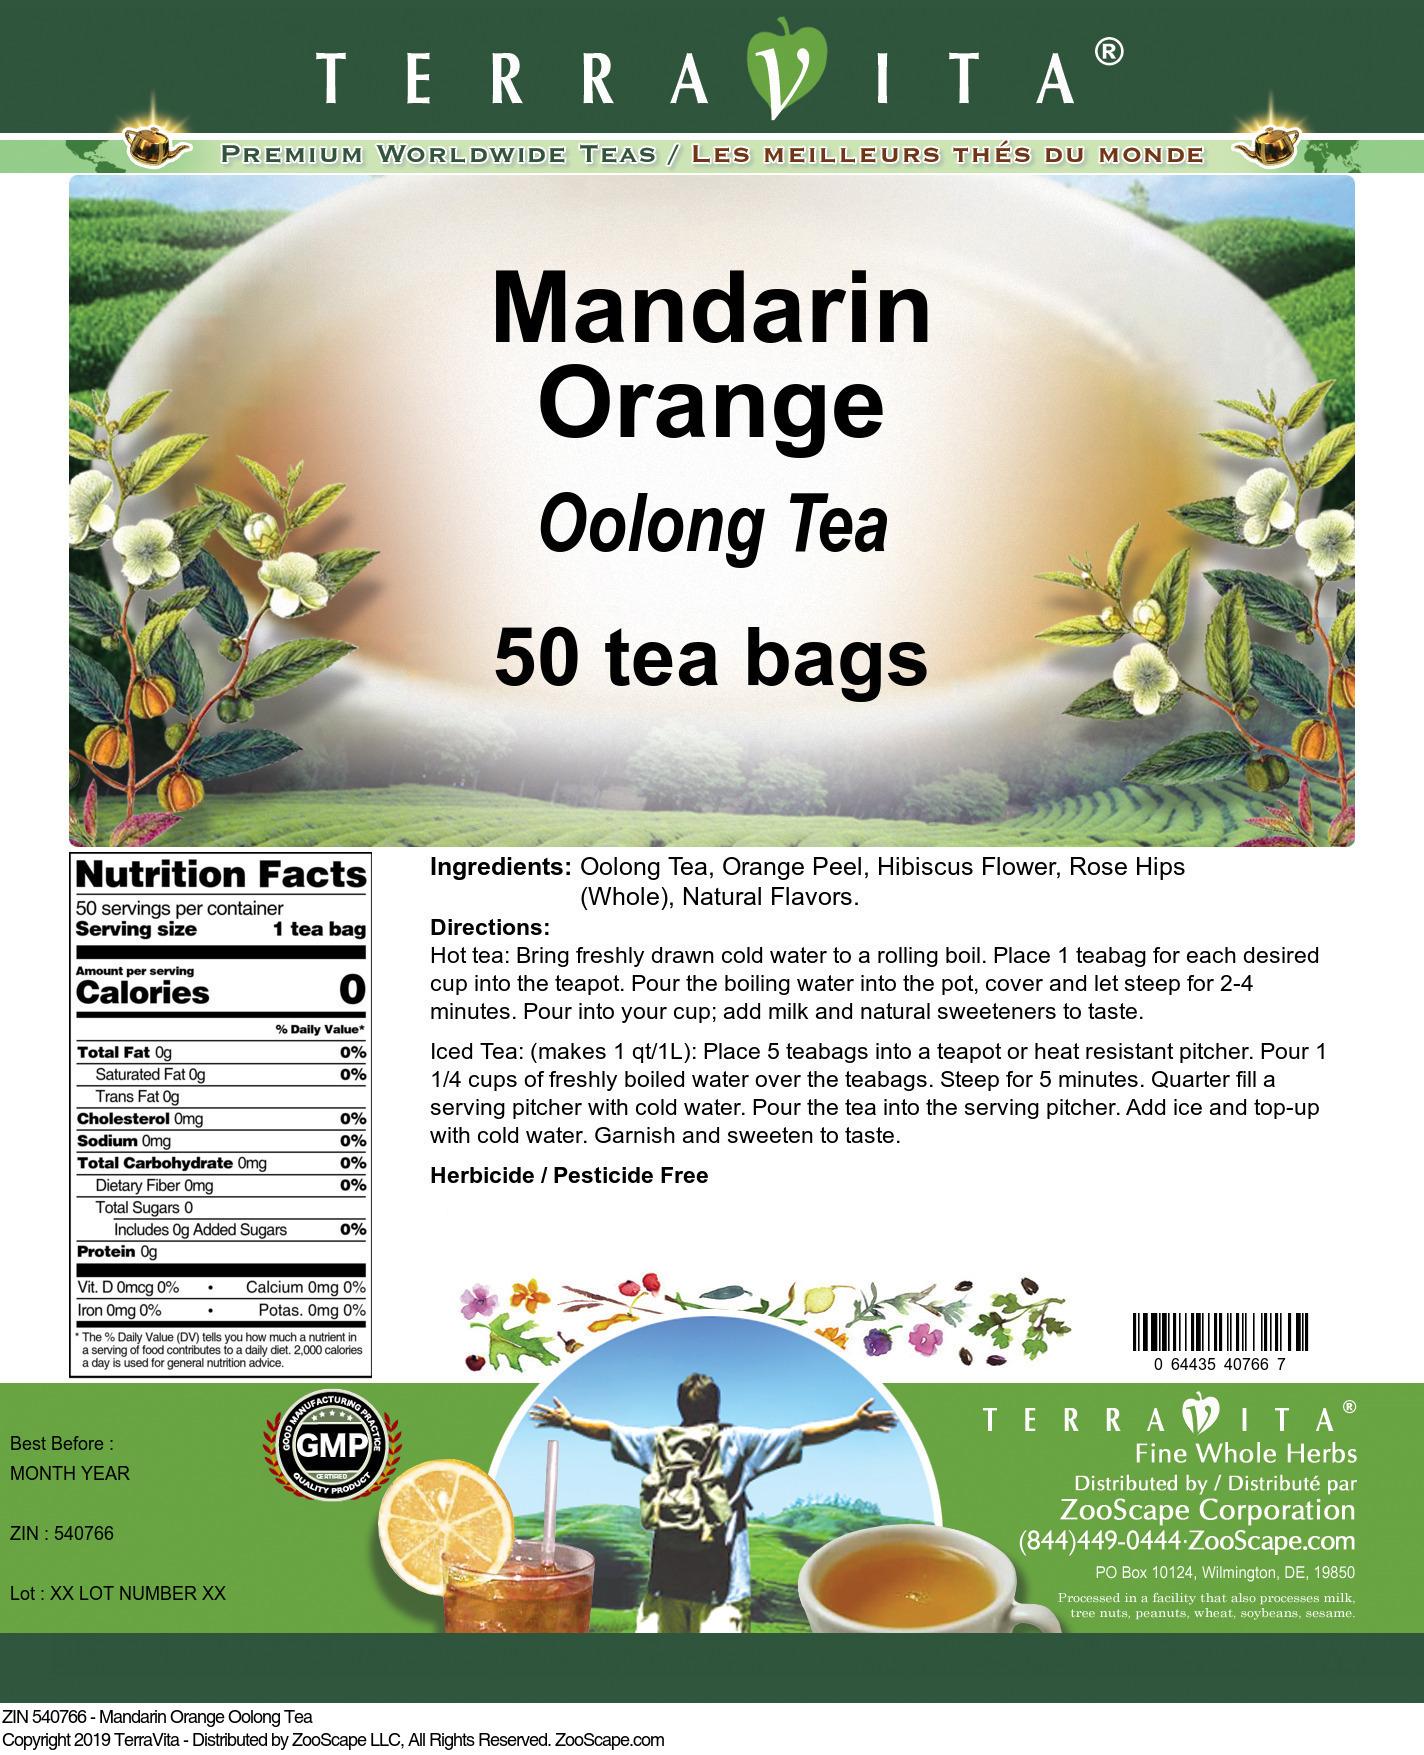 Mandarin Orange Oolong Tea